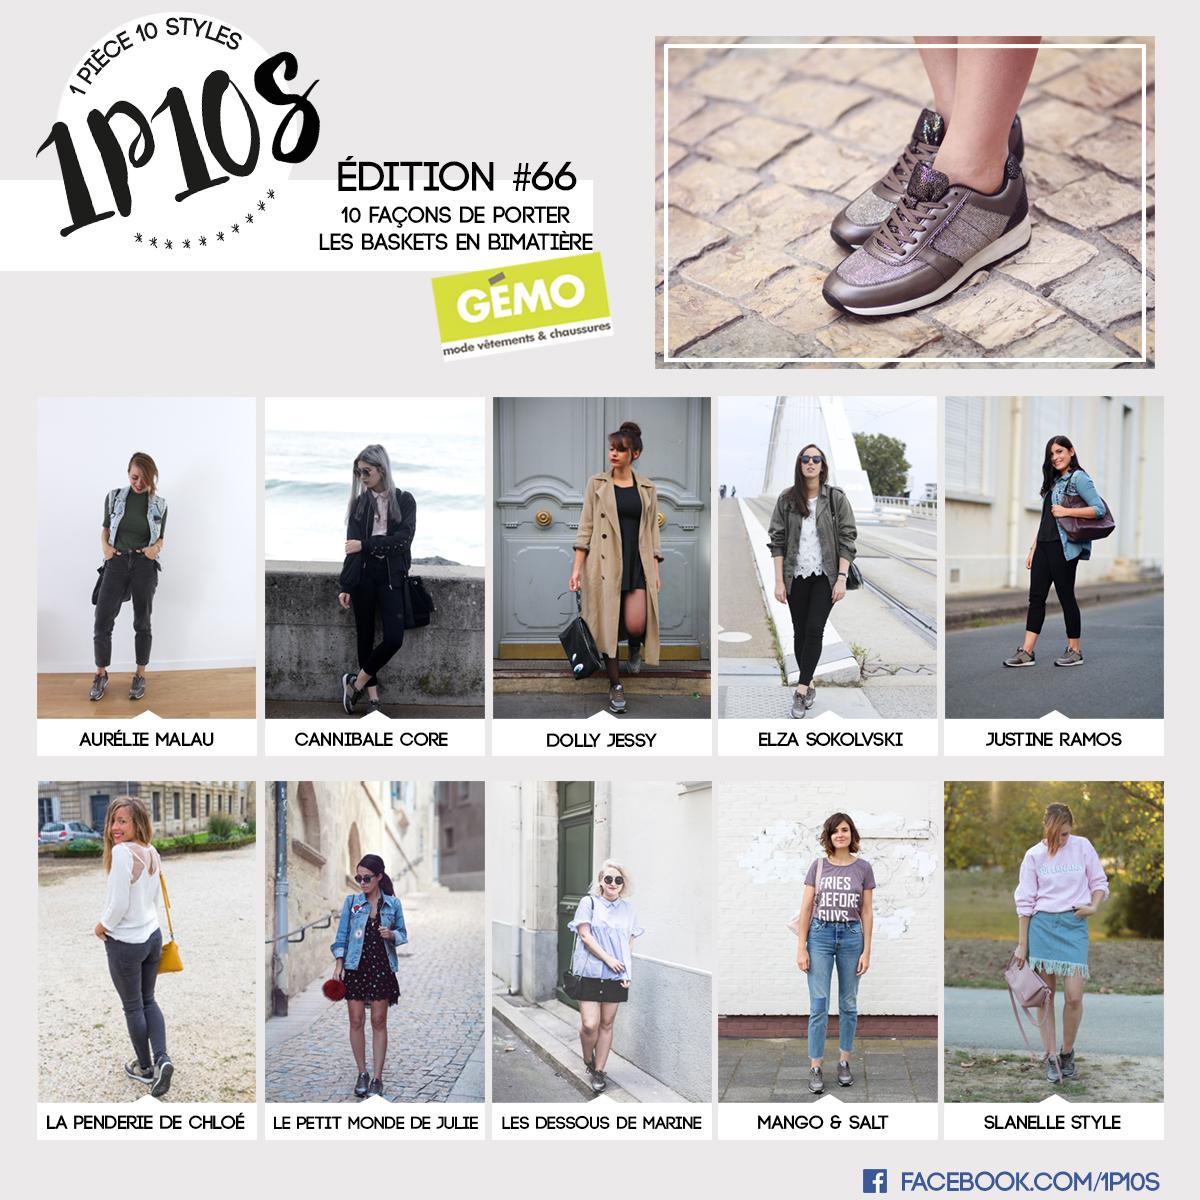 1P10S 1 pièce 10 styles - blogueuse mode  défi look